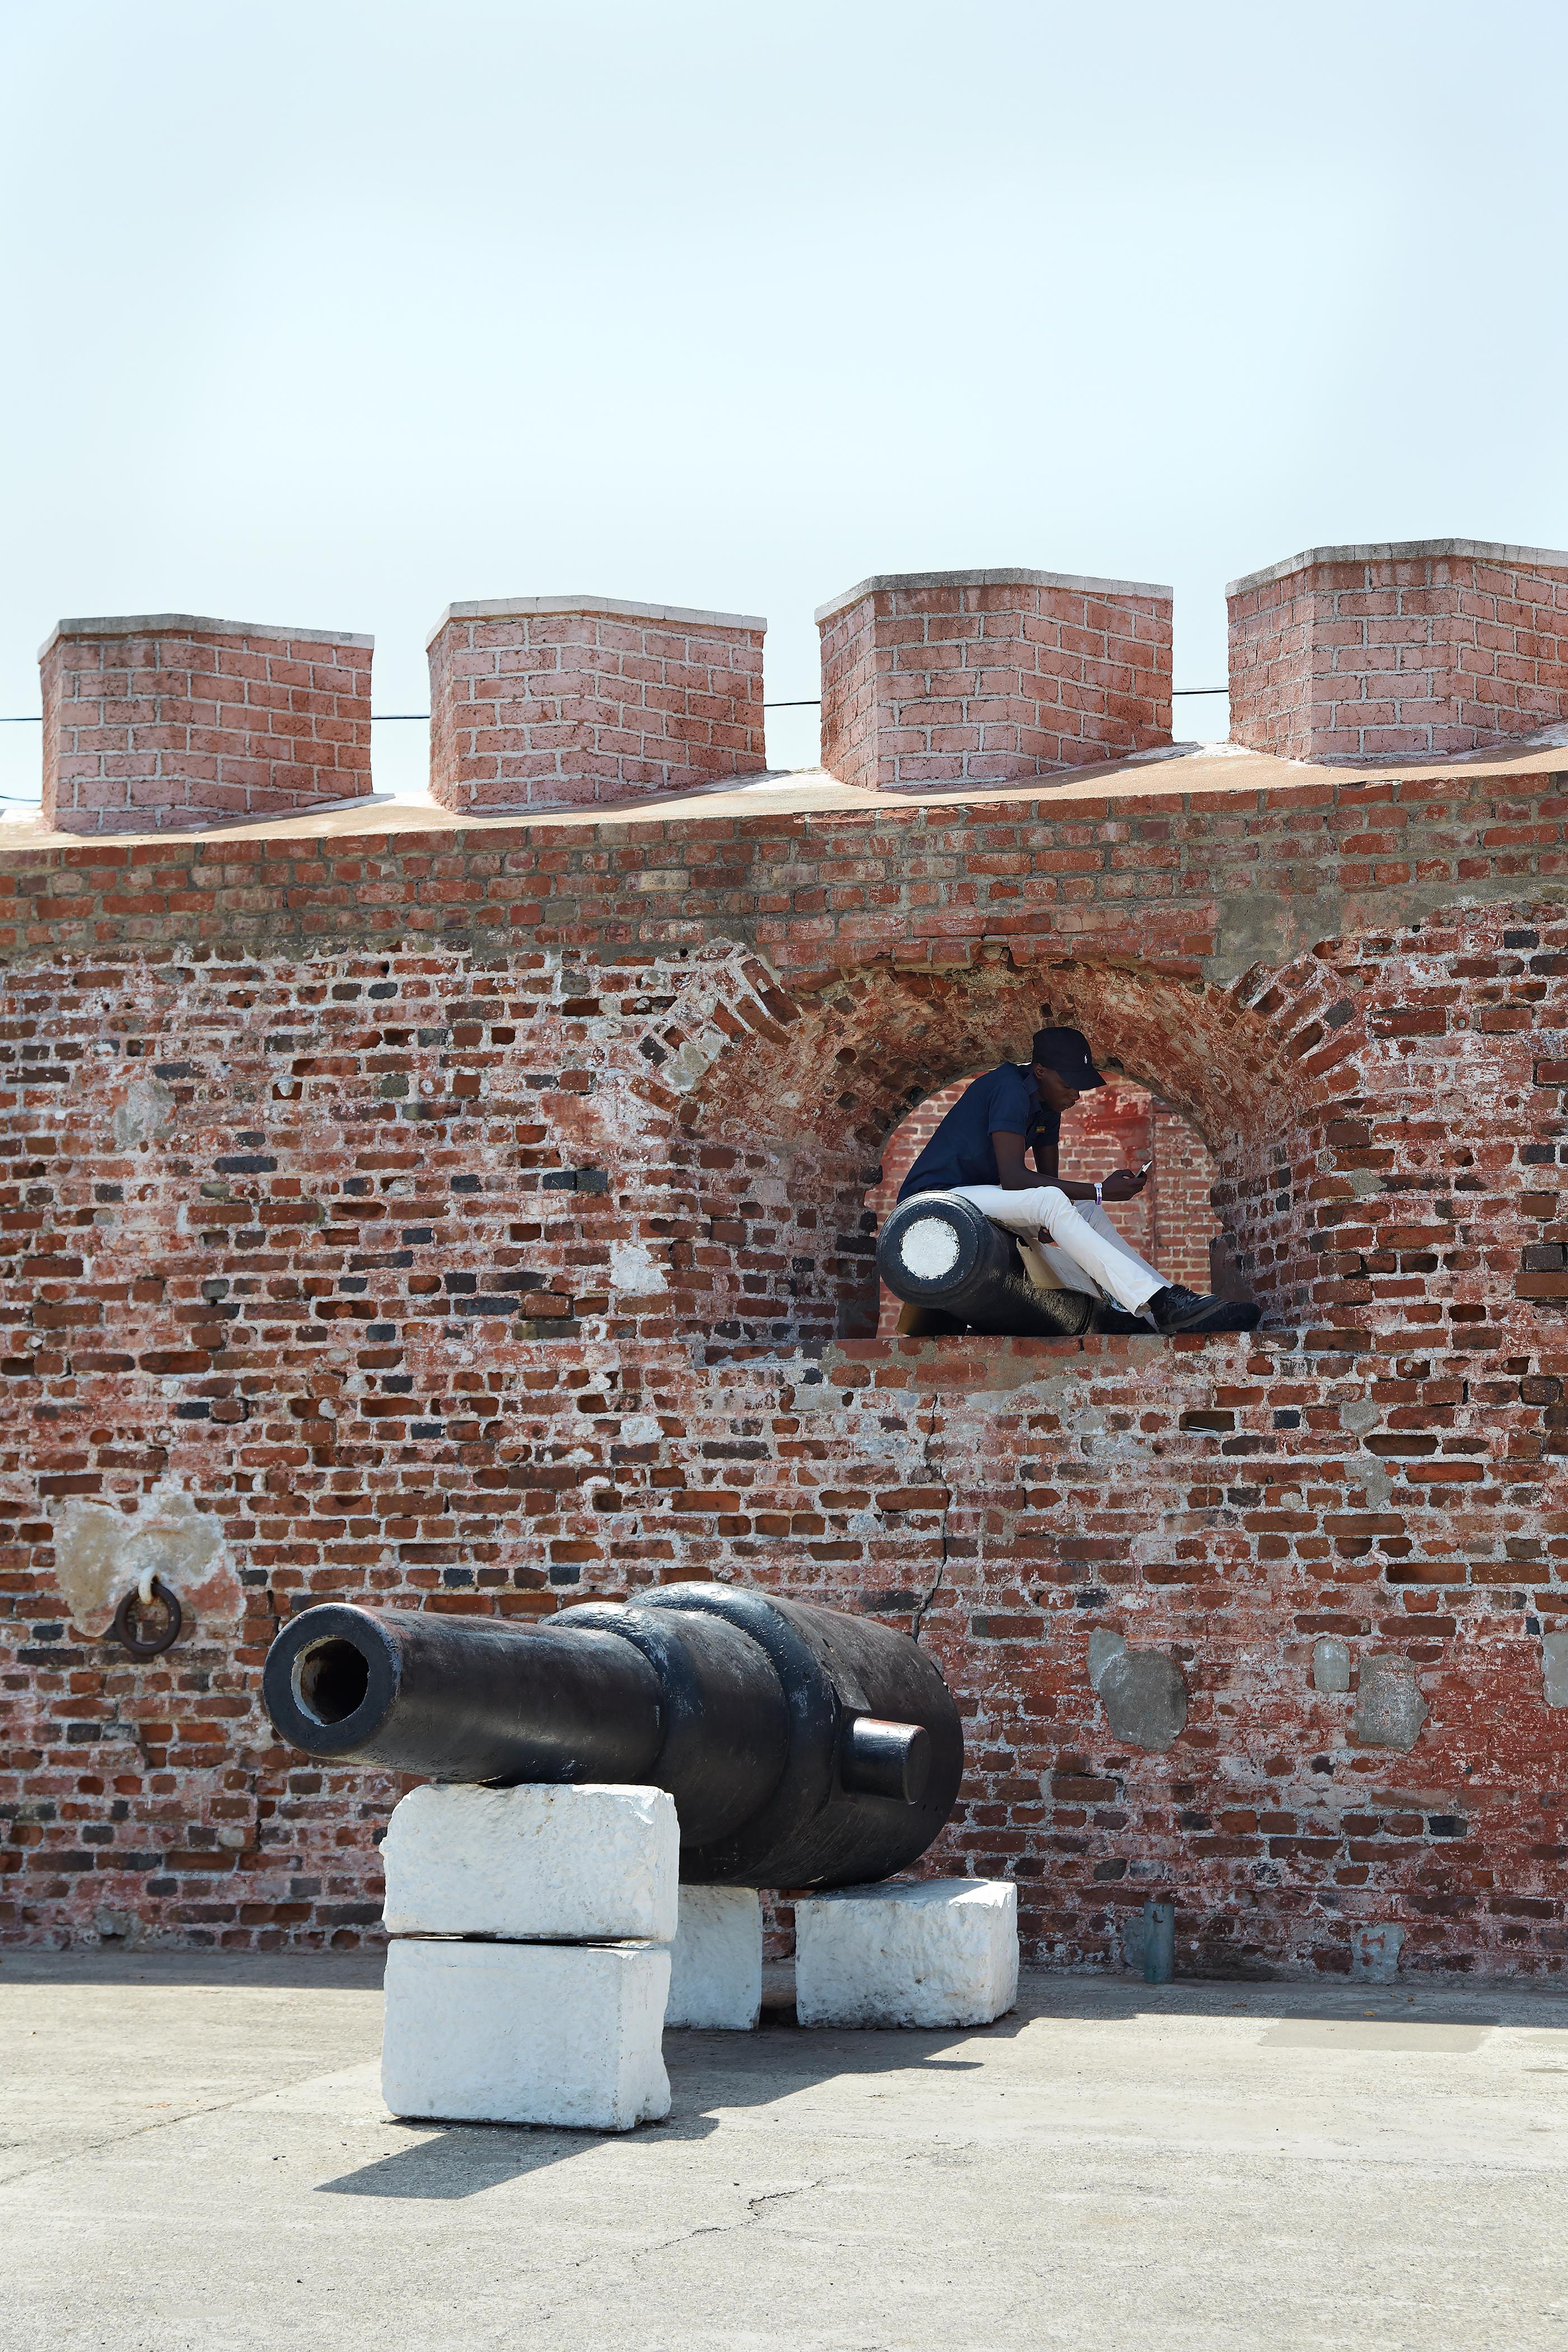 Fort Charles